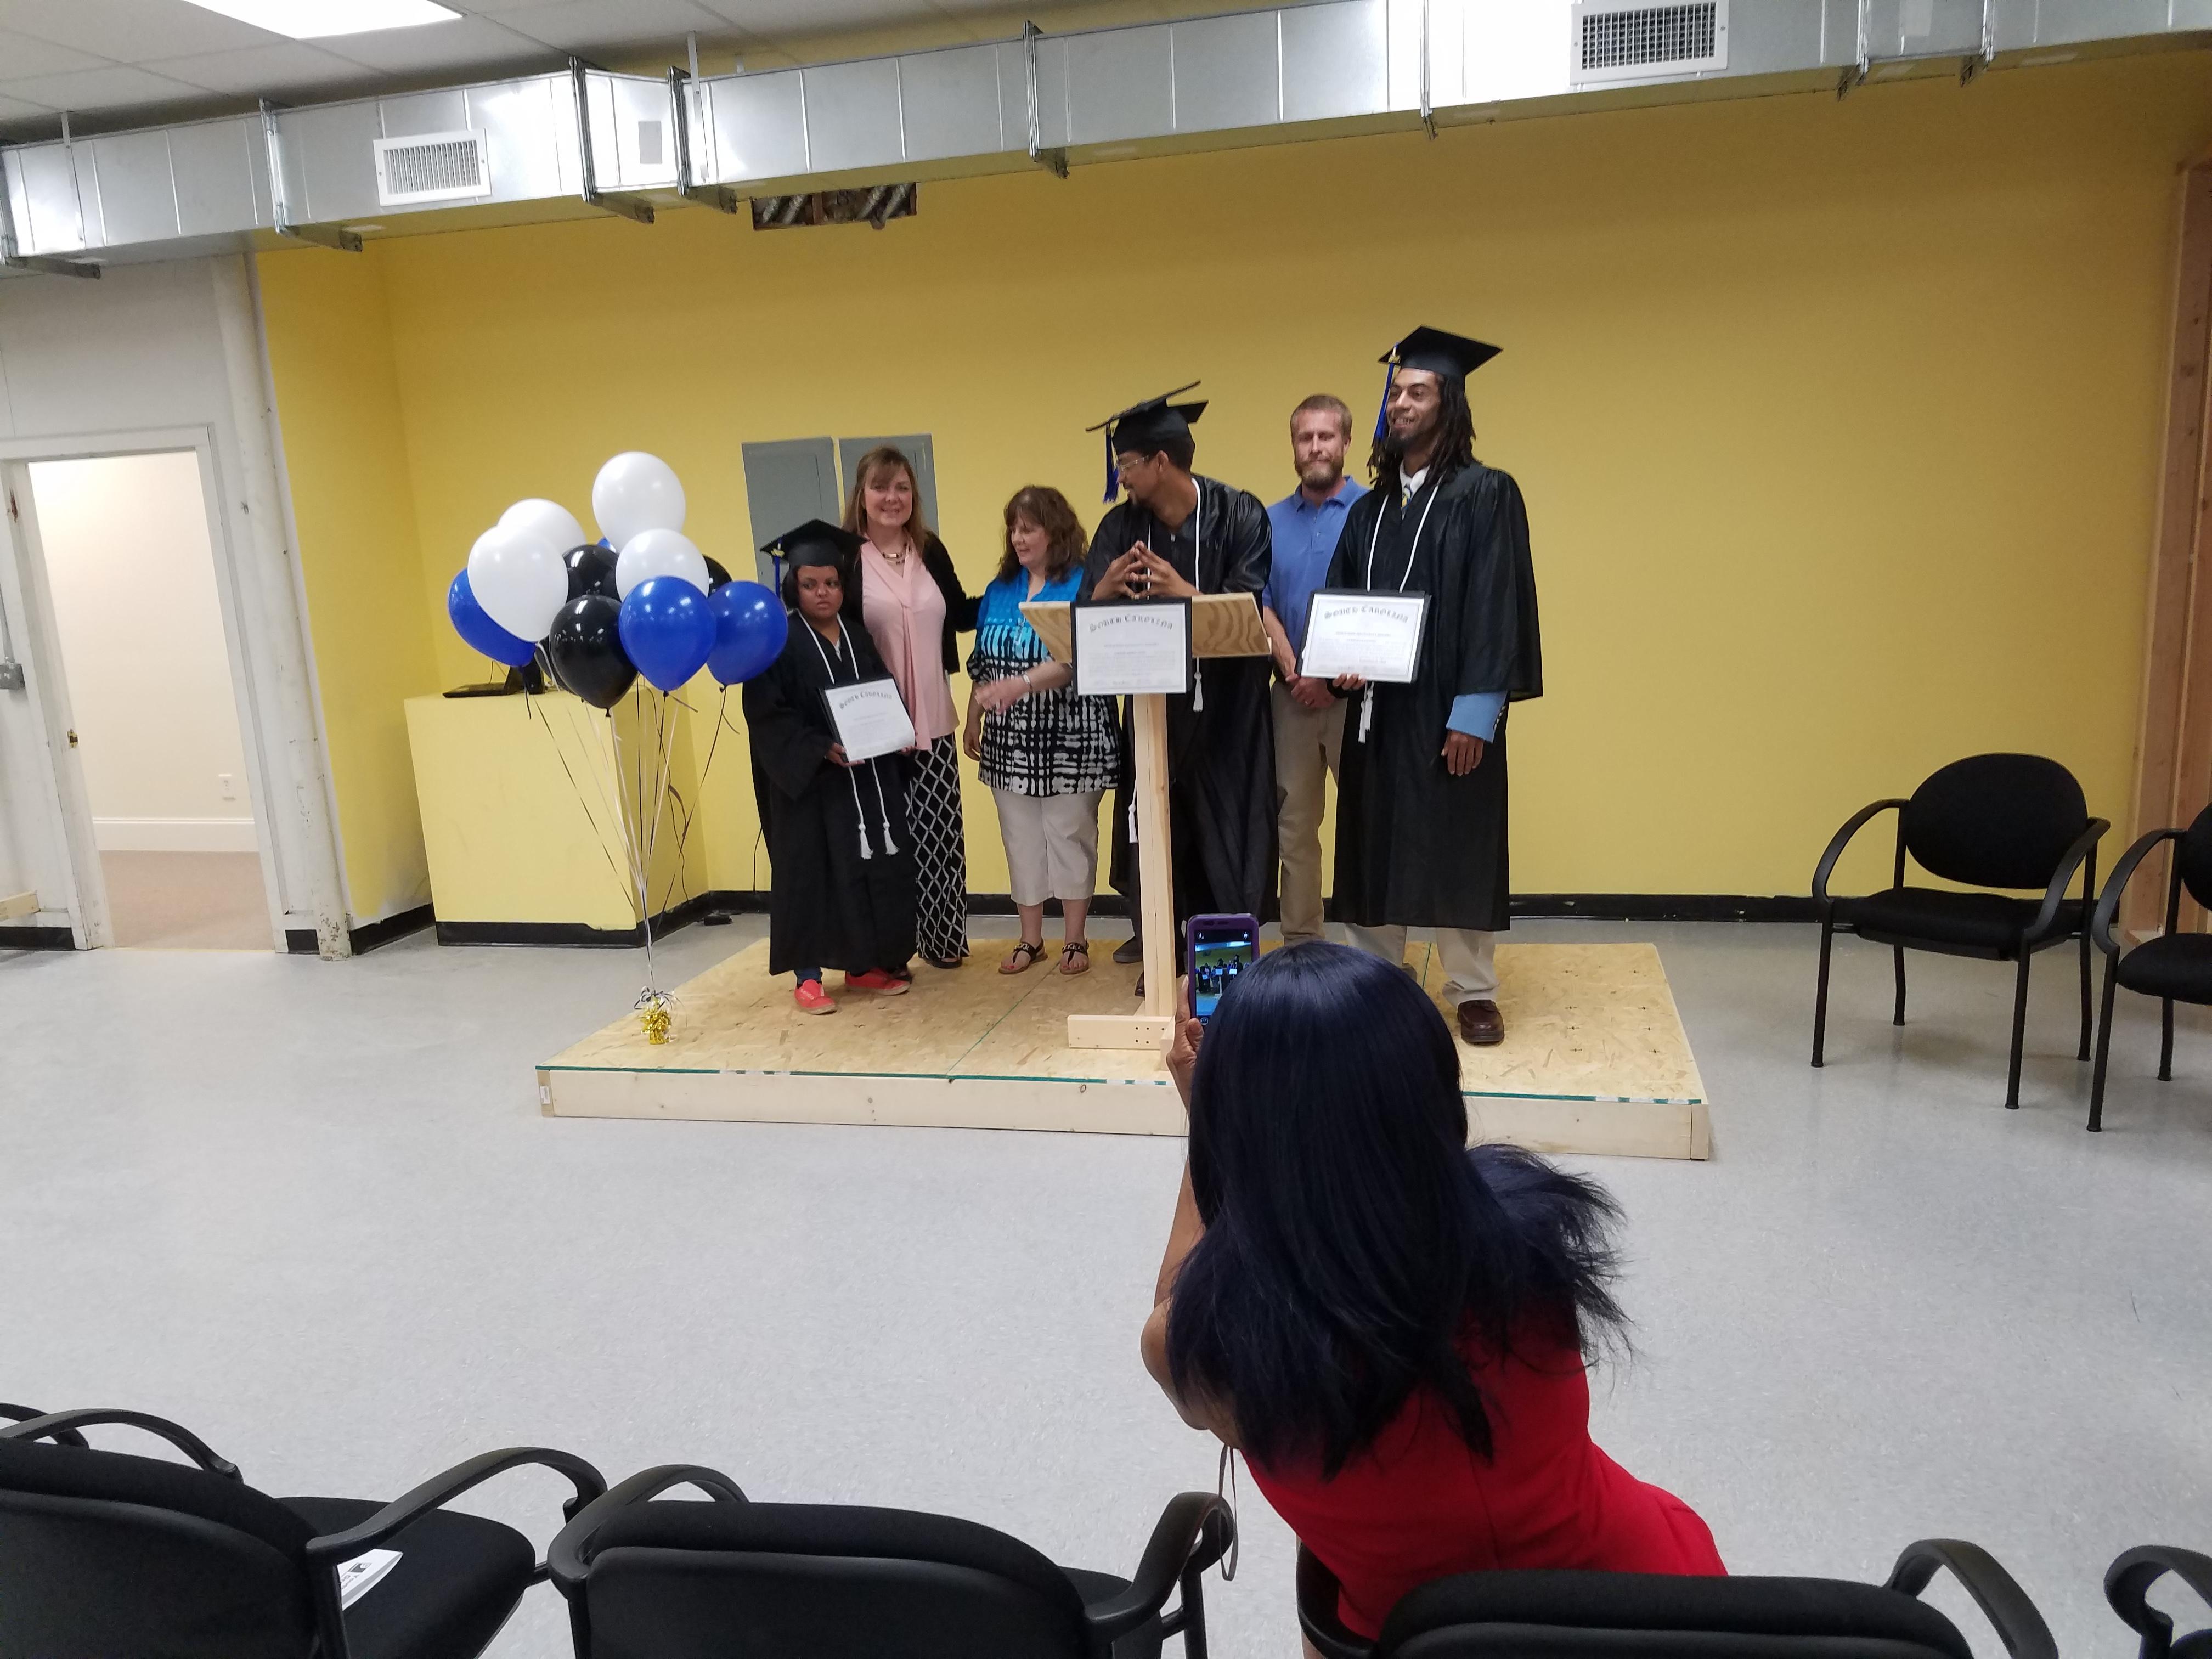 youthbuild graduates greenville revitalization corporation